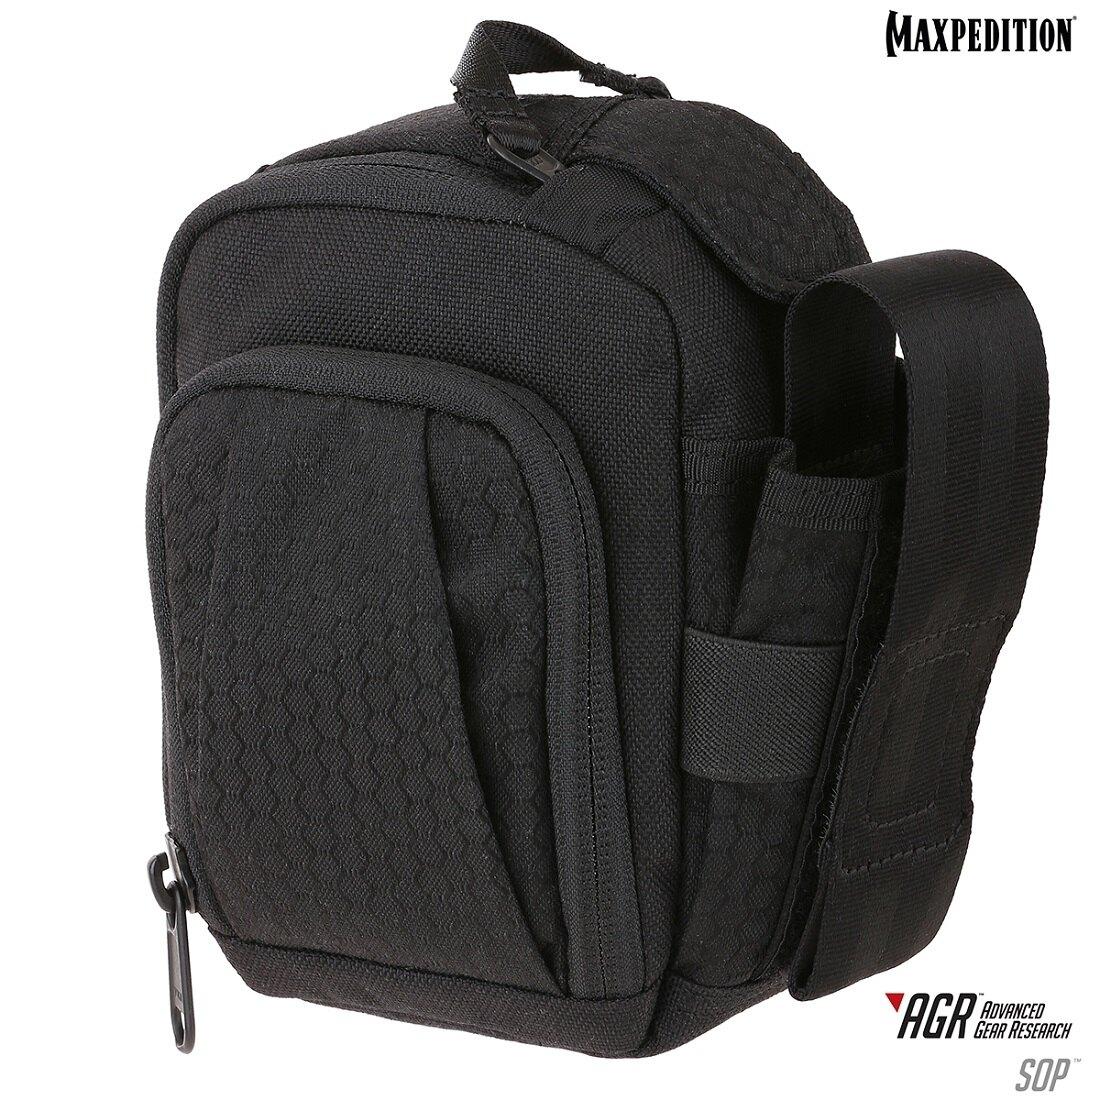 Pouzdro Side Opening Pouch (SOP) Maxpedition® – Čierna (Farba: Čierna)